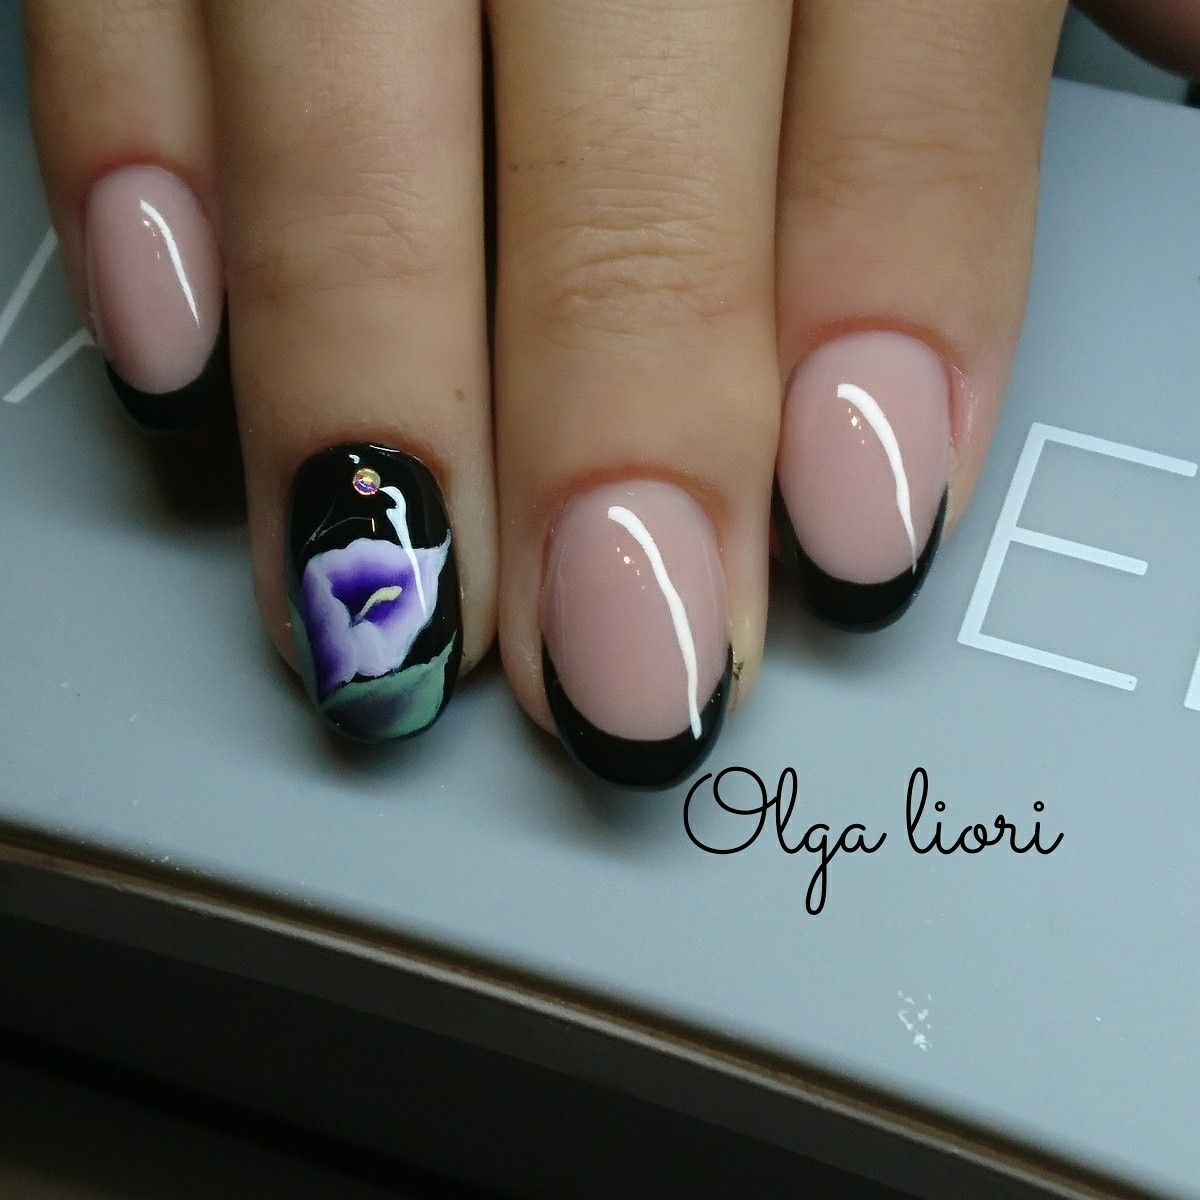 Black nails french flower   olga liori naillover   Pinterest   Nail ...